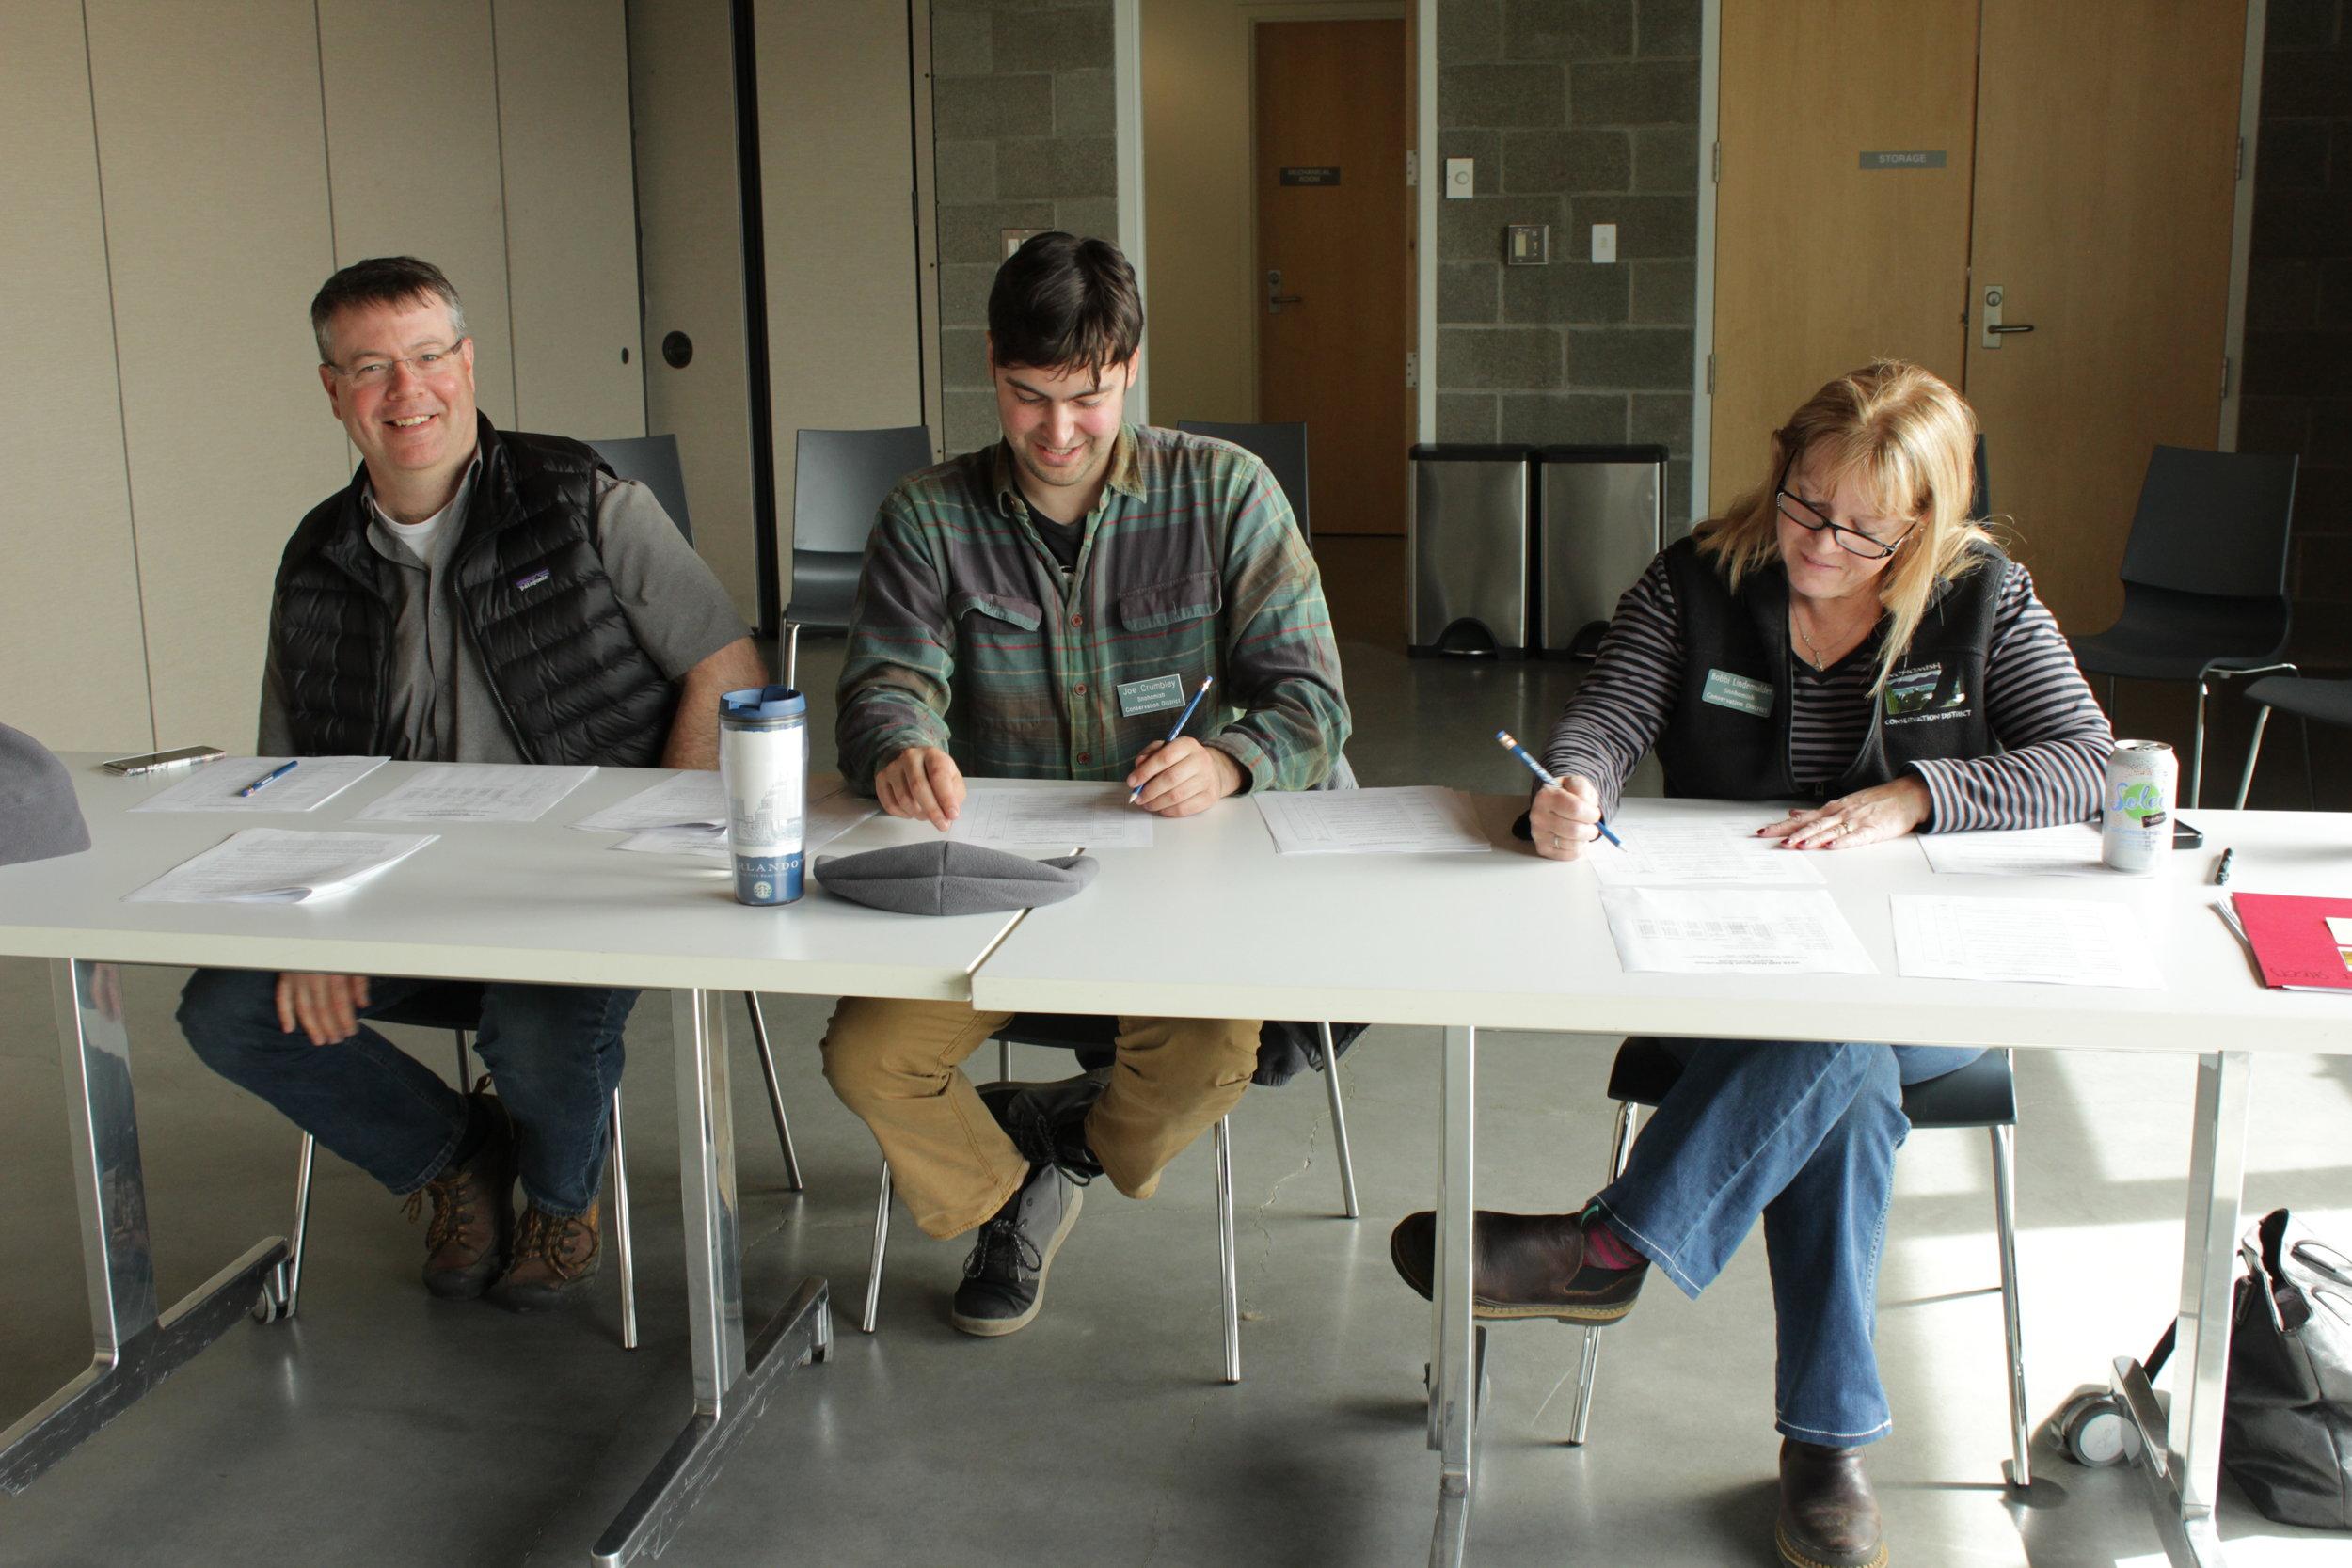 SCD Staff - Eric Schuh, Joe Crumbley and Bobbi Lindemulder